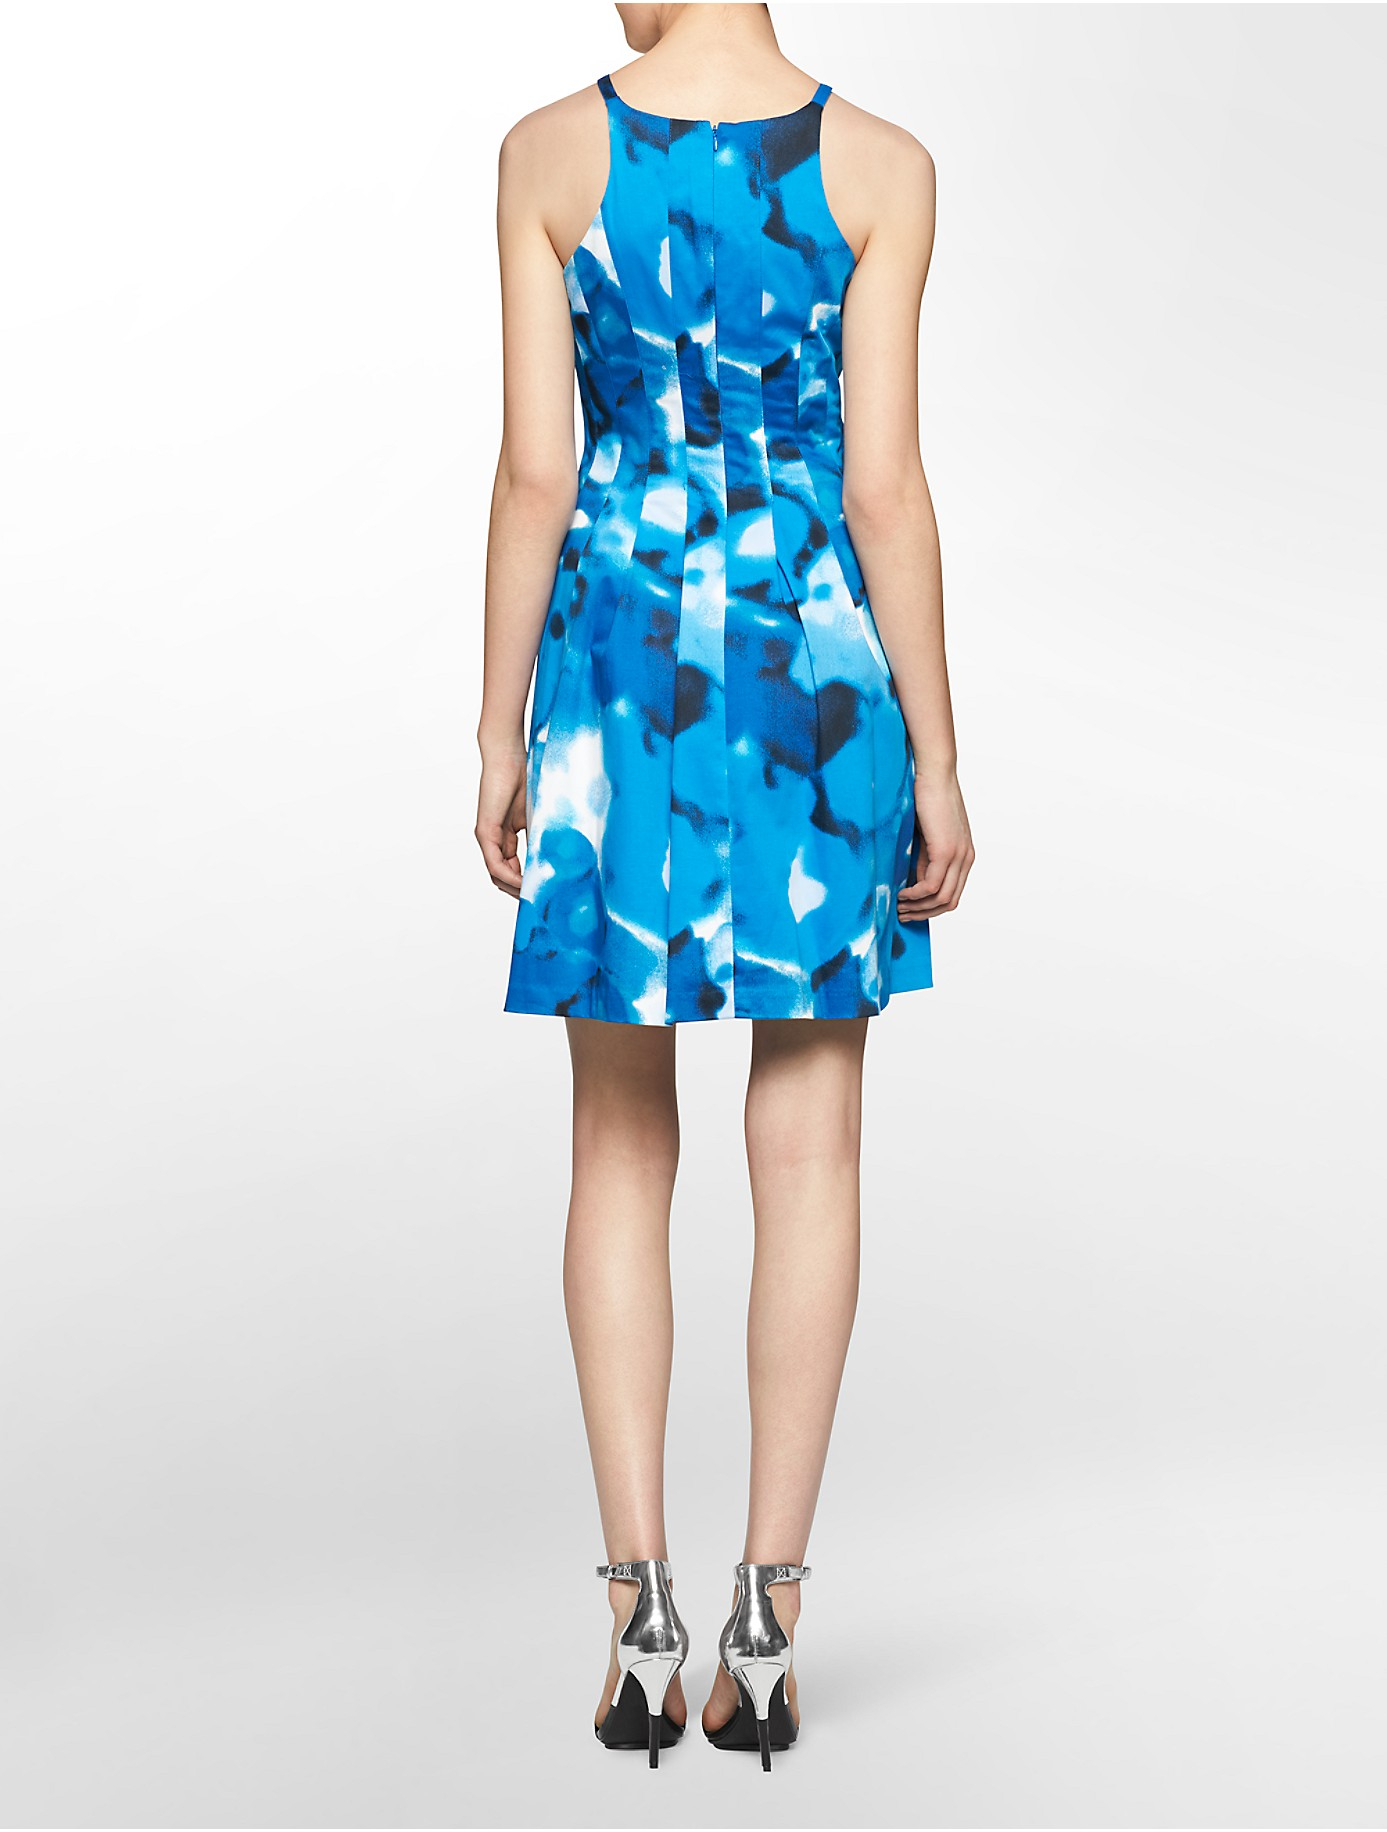 Calvin Klein White Label Floral Print Halter Fit Flare